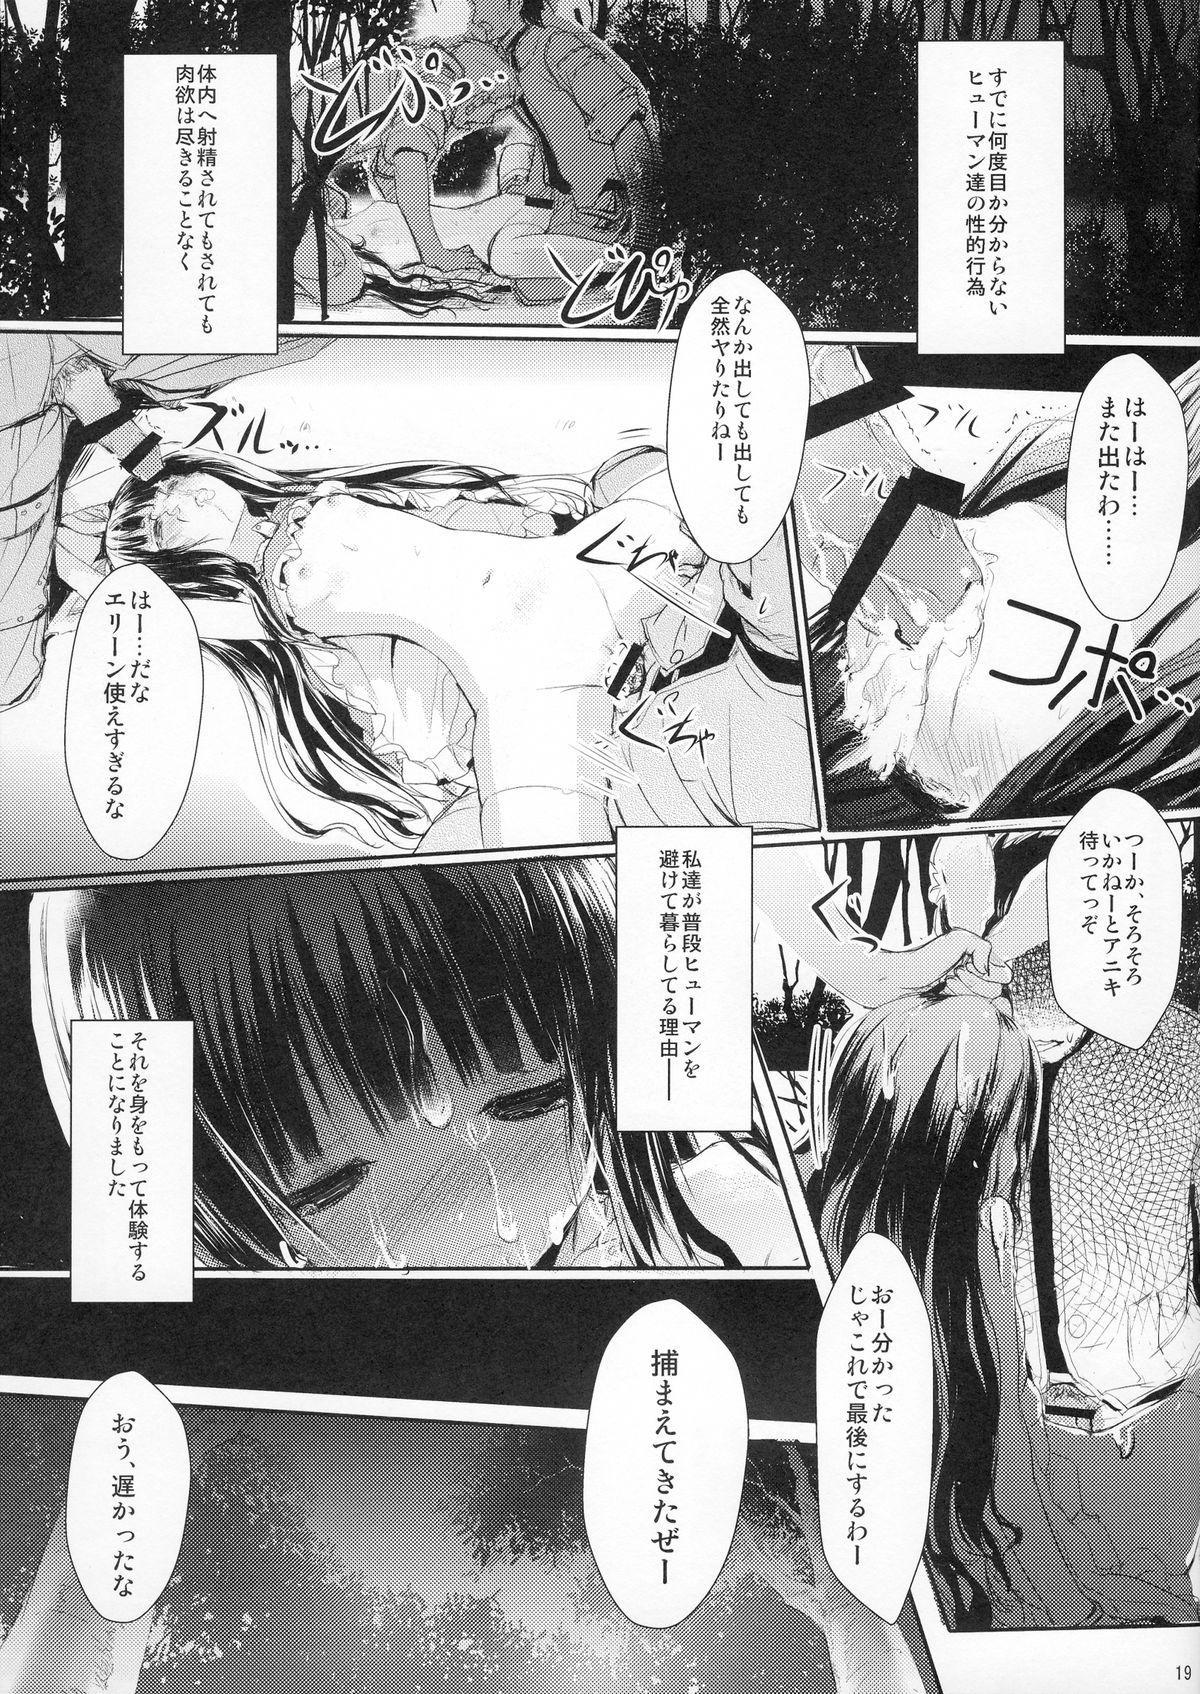 [Mirukomi (PRIMIL)] Human wa Erin-chan ni Hidoi Koto Shitai yo ne - ELIN's the best - (TERA The Exiled Realm of Arborea) 18